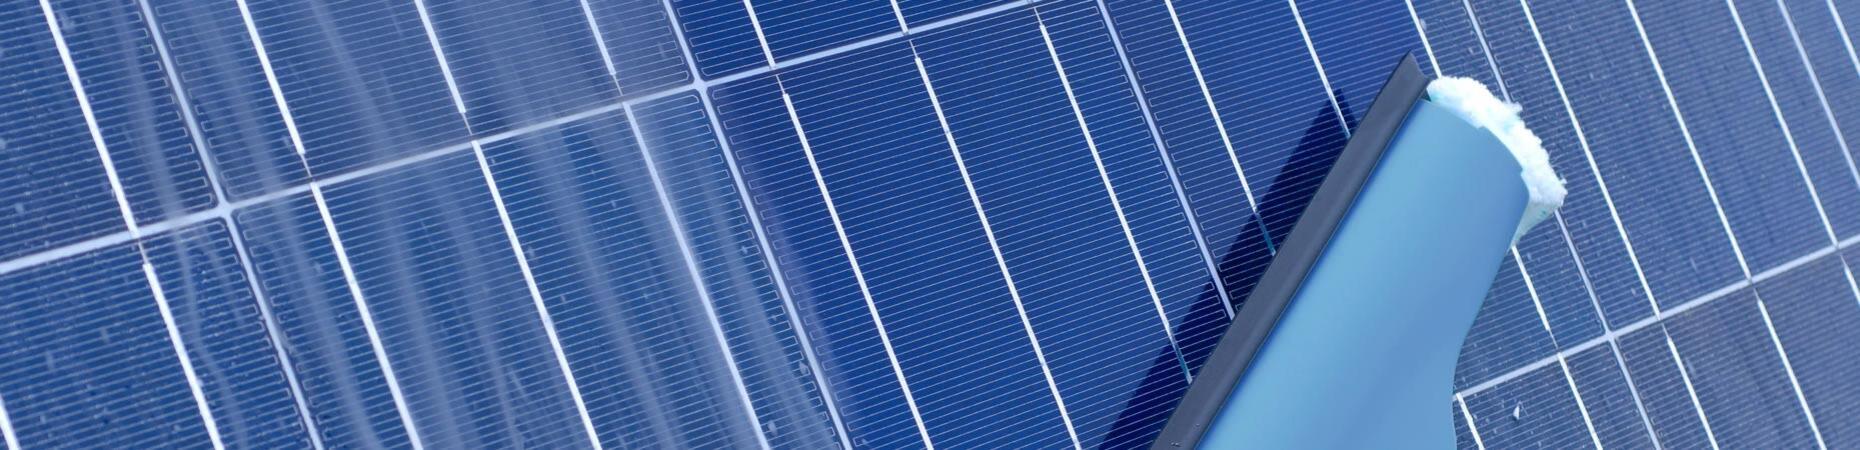 ecoservice-reggioemilia it pulizie-pannelli-solari-reggio-emilia 005